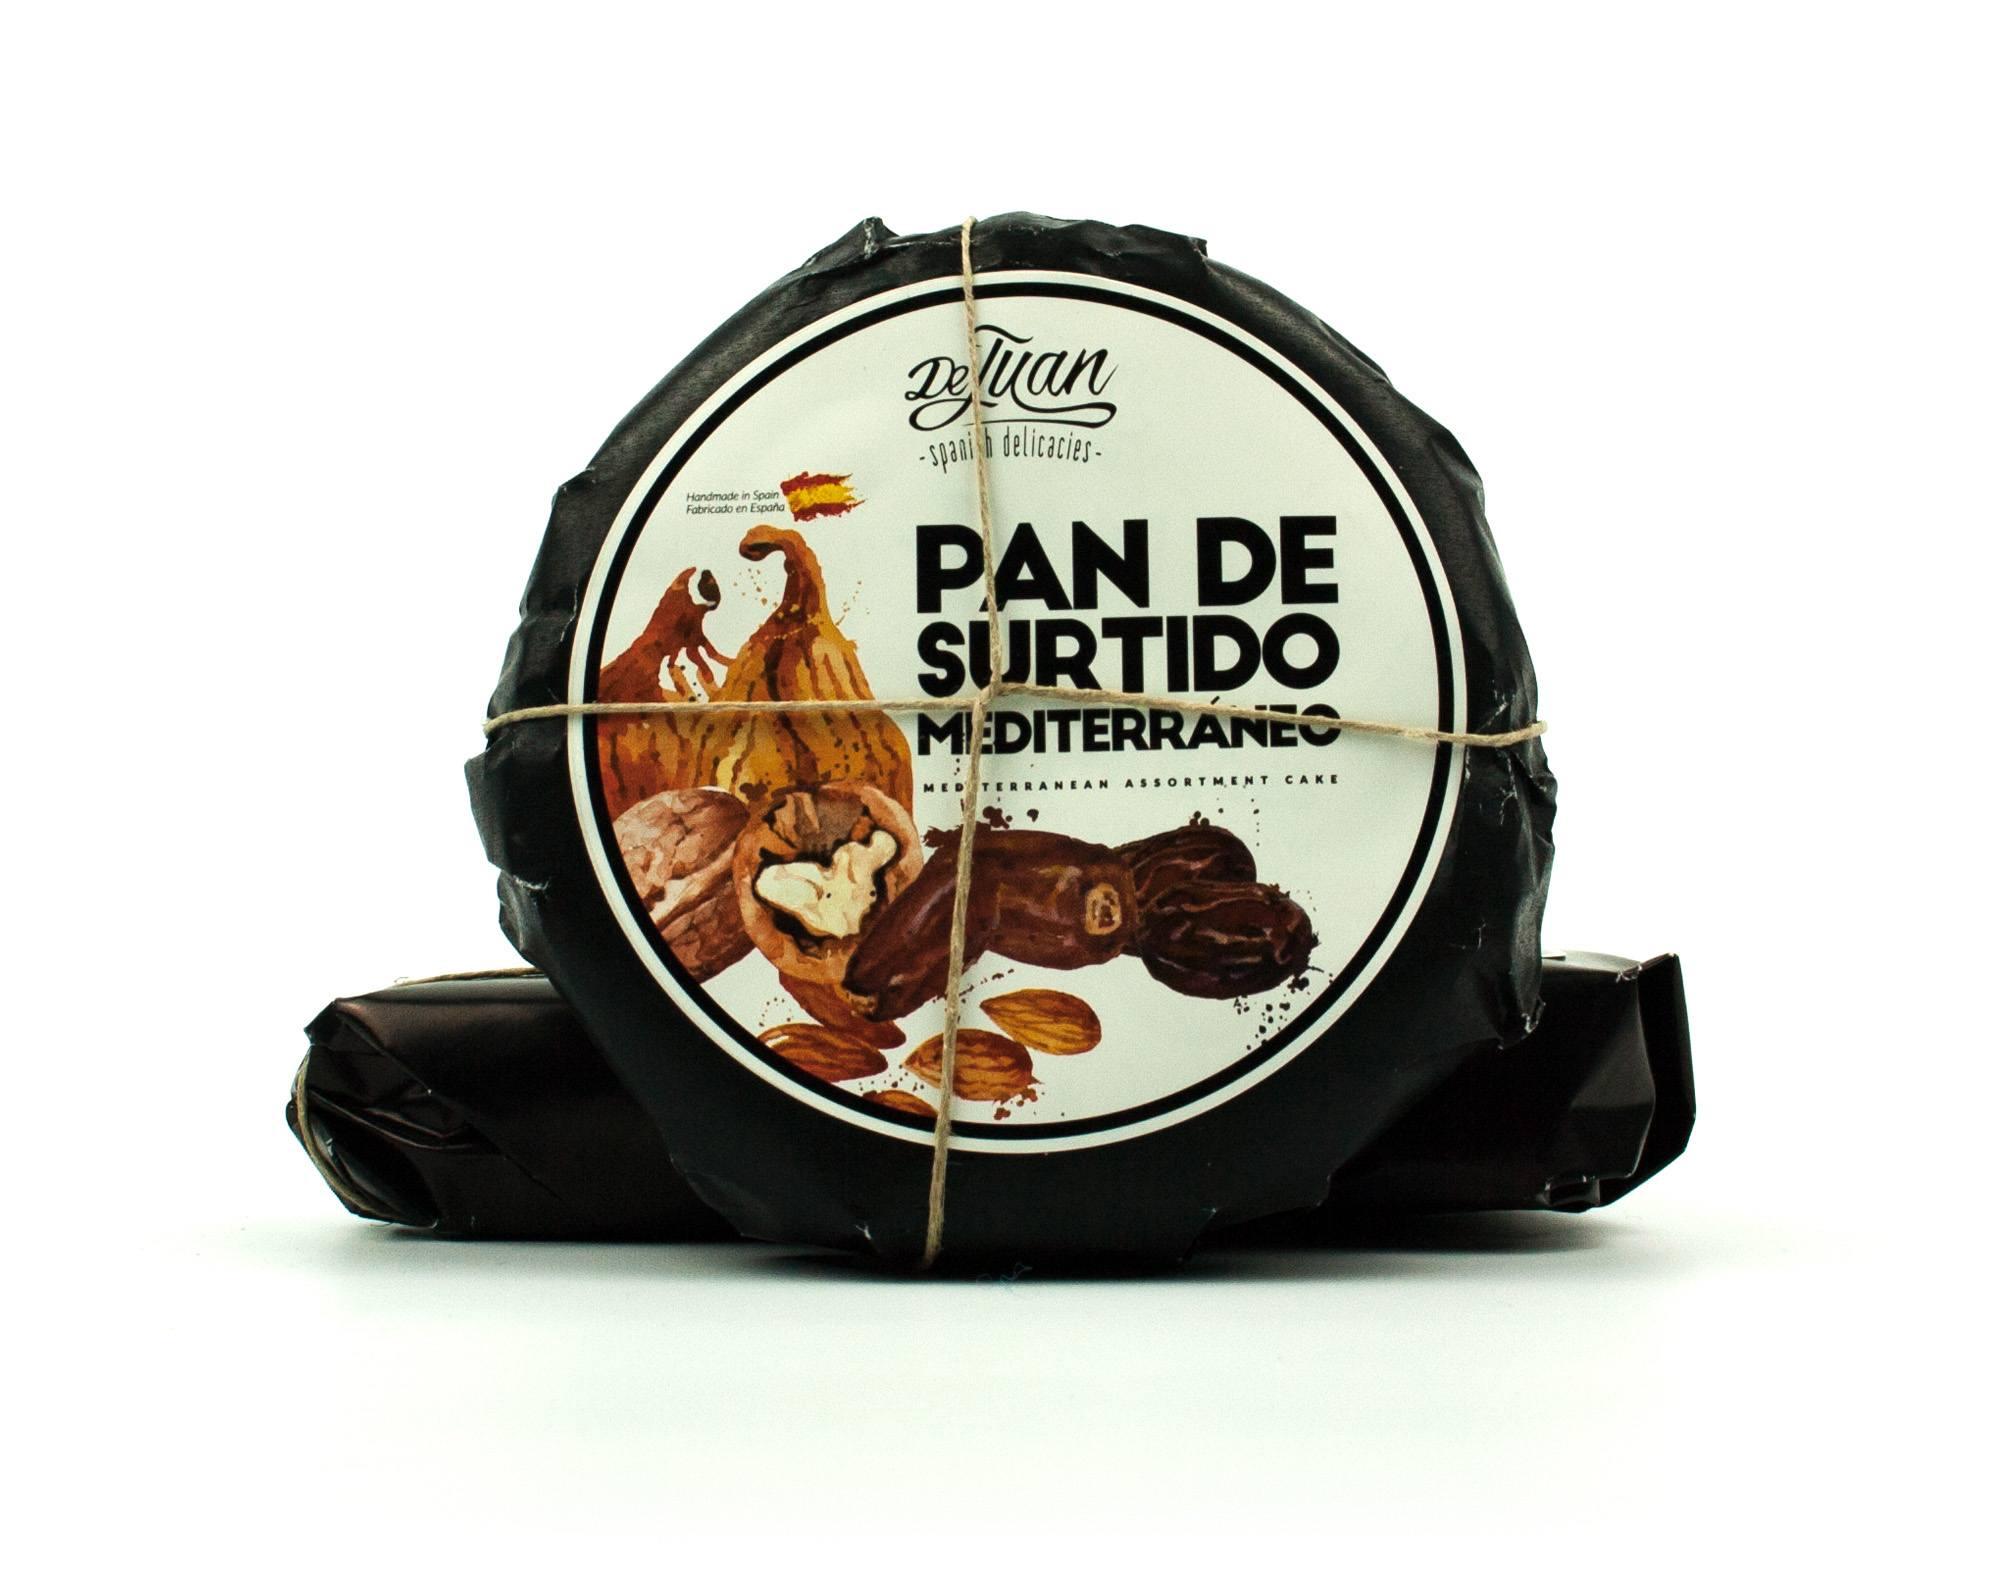 Pan de Surtido Mediterráneo Gourmet